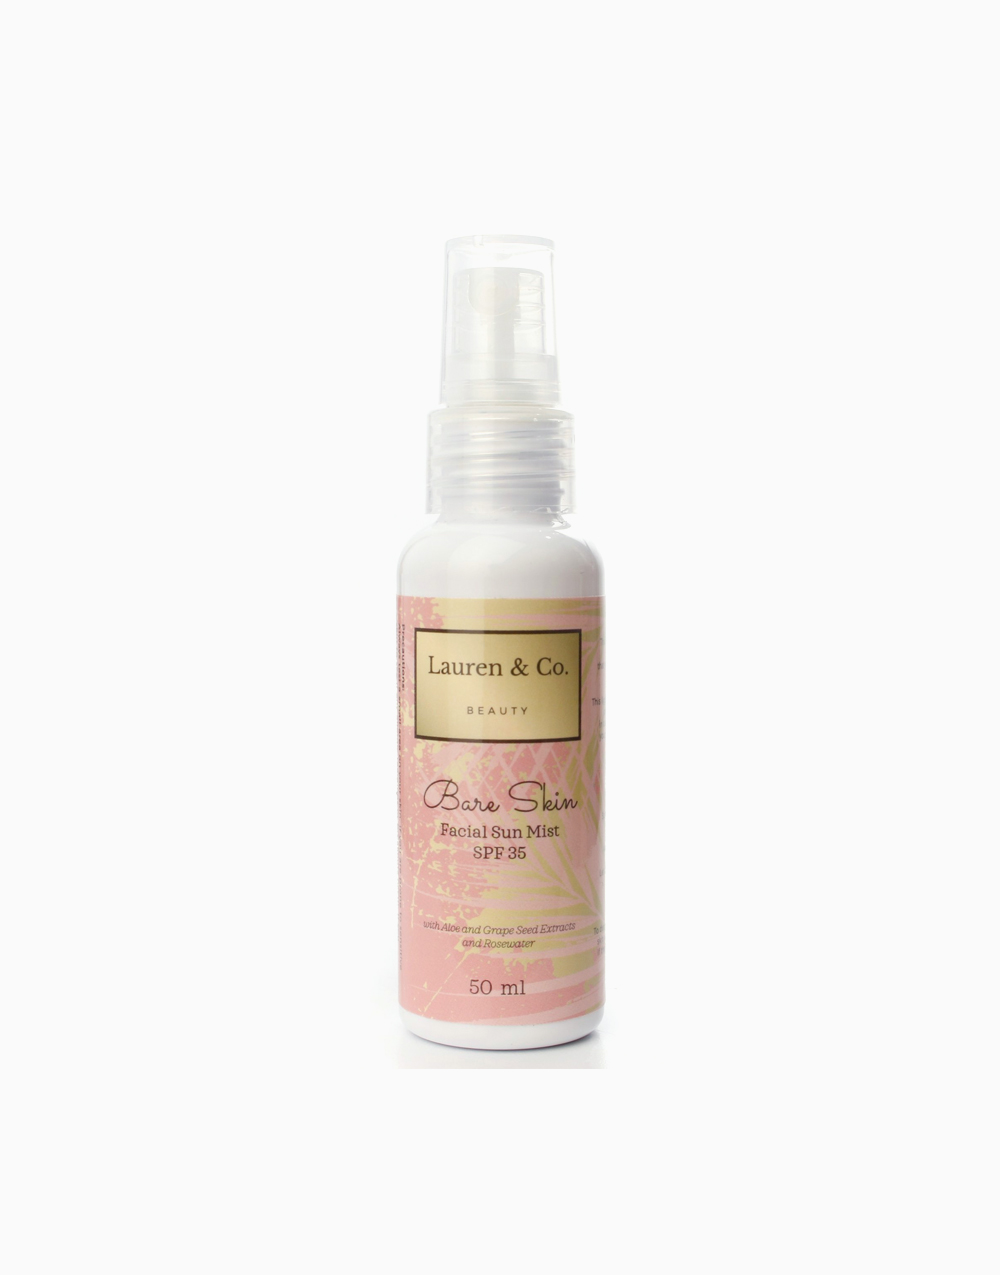 Bare Skin Facial Sun Mist with SPF 35 - Renewed (50ml) by Lauren & Co Beauty